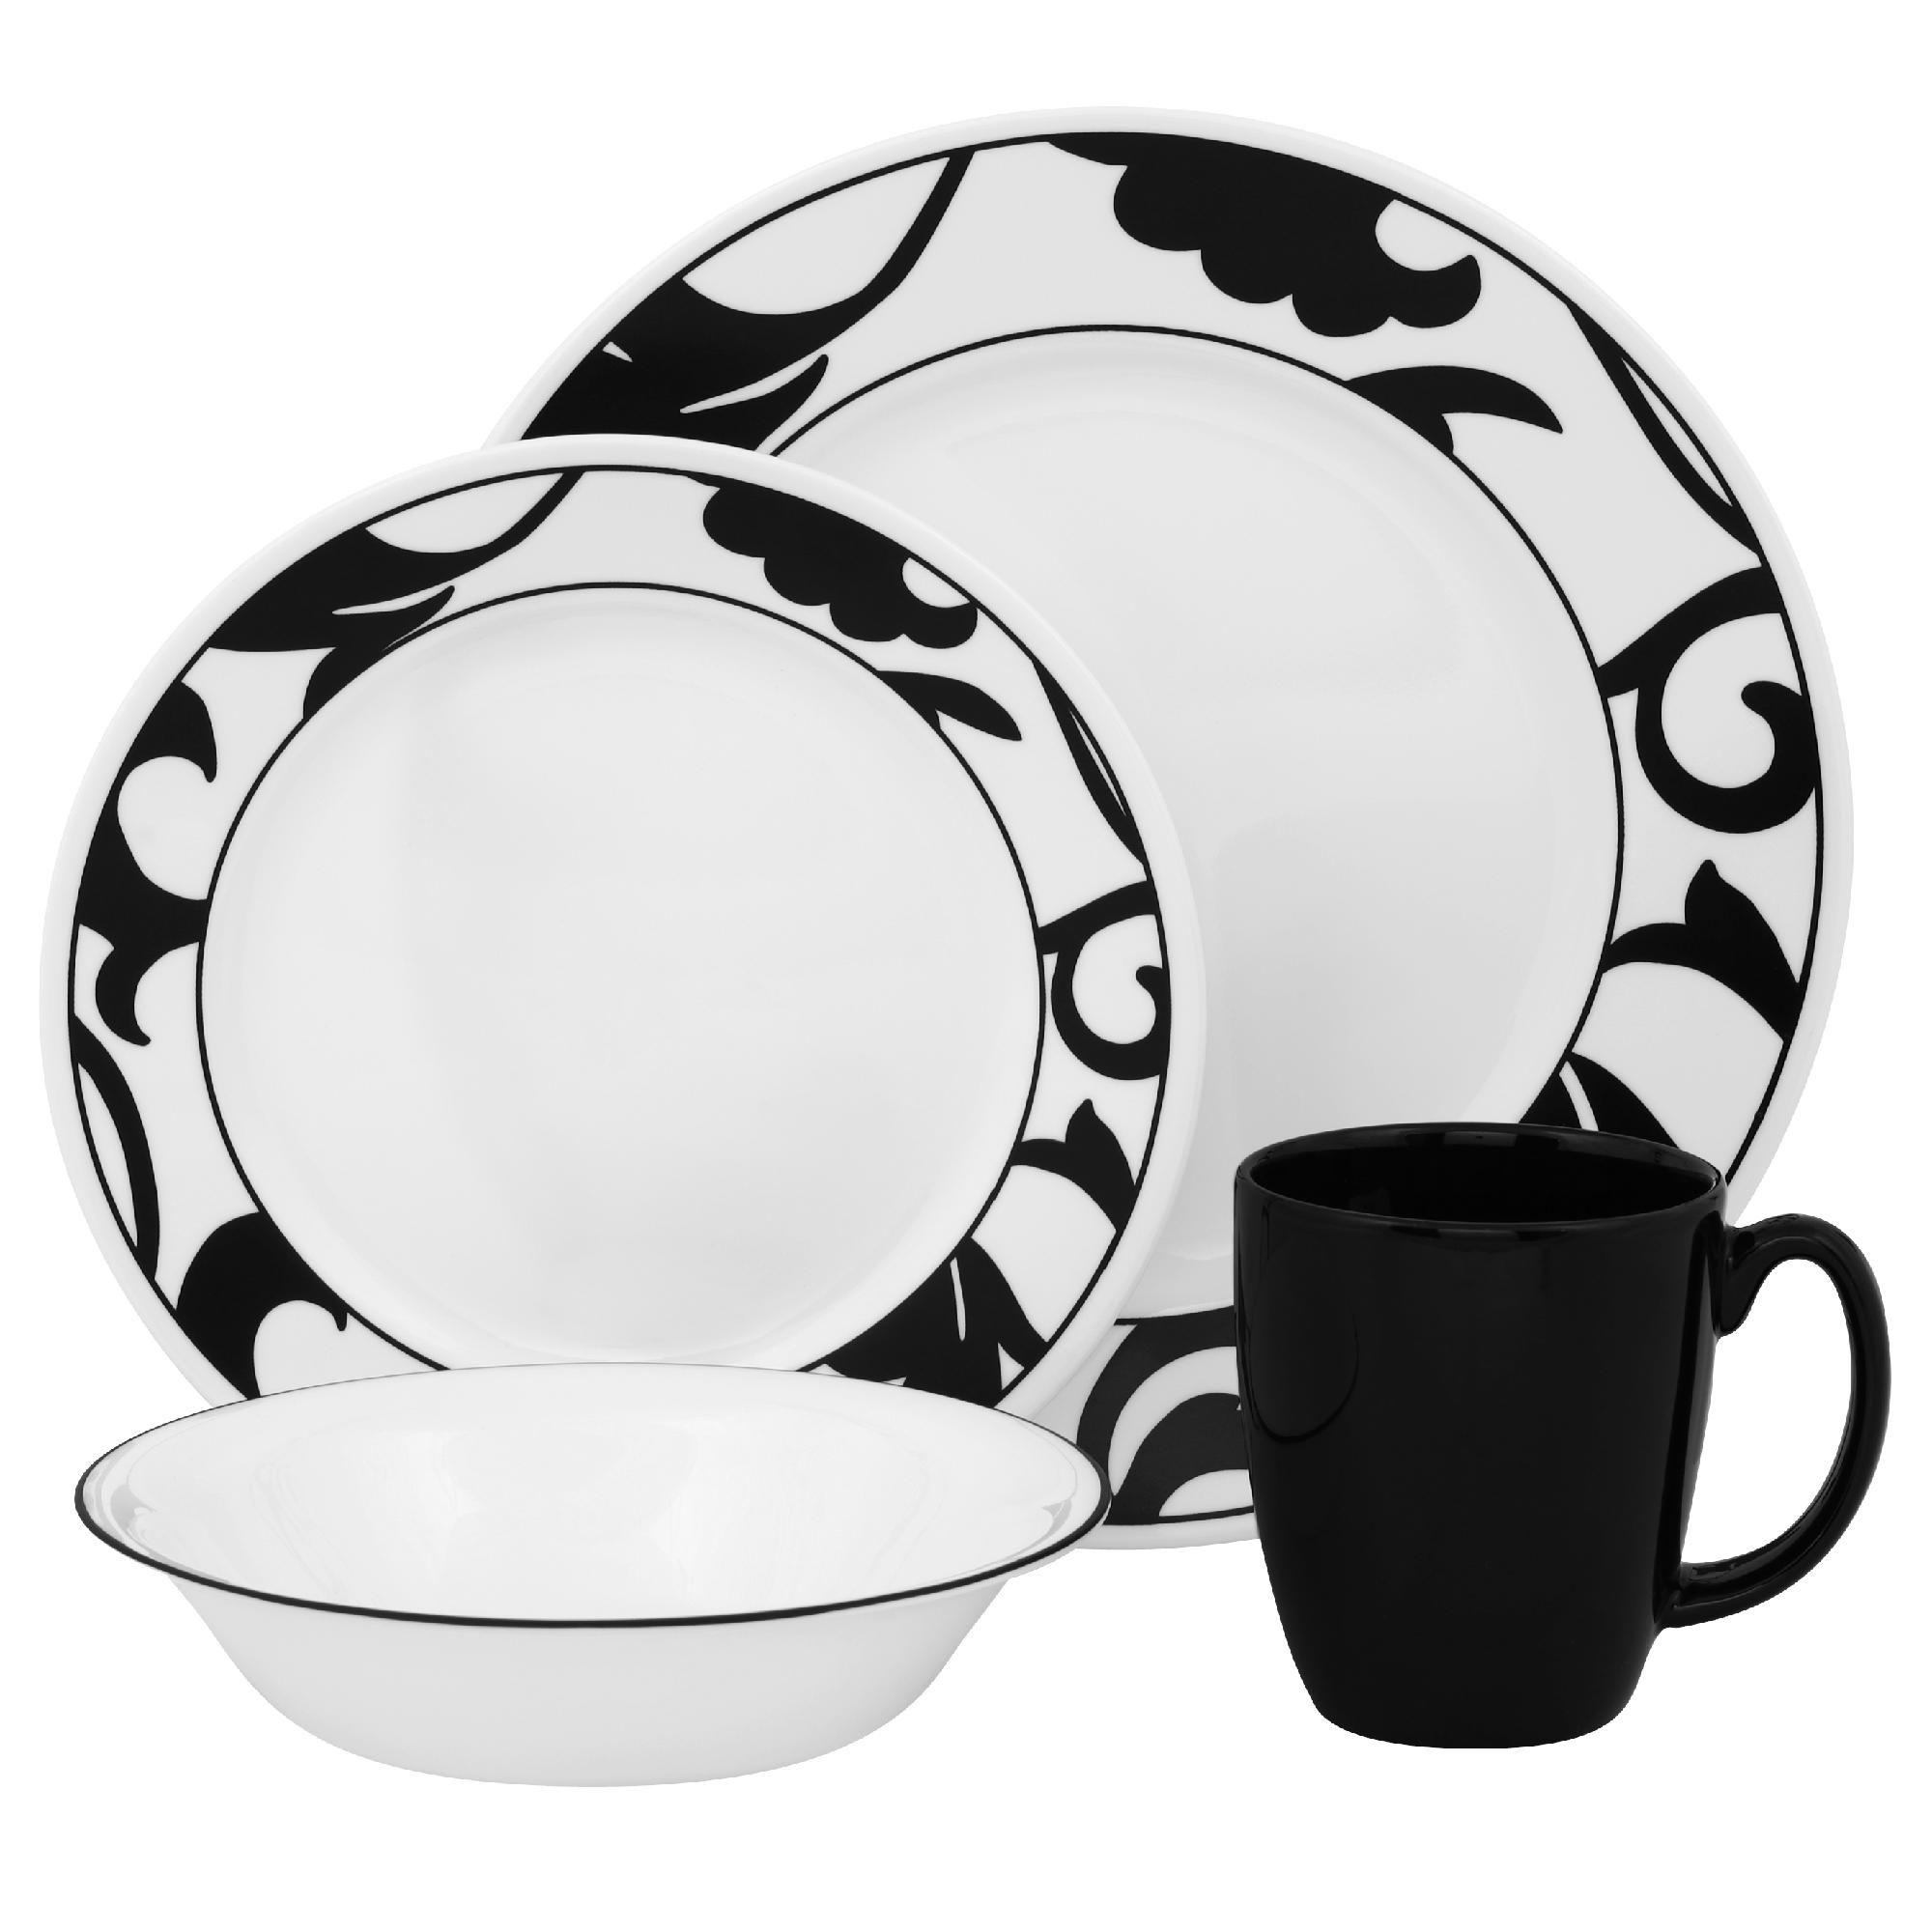 Corelle Vive Noir 16pc Dinnerware Set - Home - Dining u0026 Entertaining - Tableware - Dinnerware Sets u0026 Collections  sc 1 st  Sears & Corelle Vive Noir 16pc Dinnerware Set - Home - Dining u0026 Entertaining ...